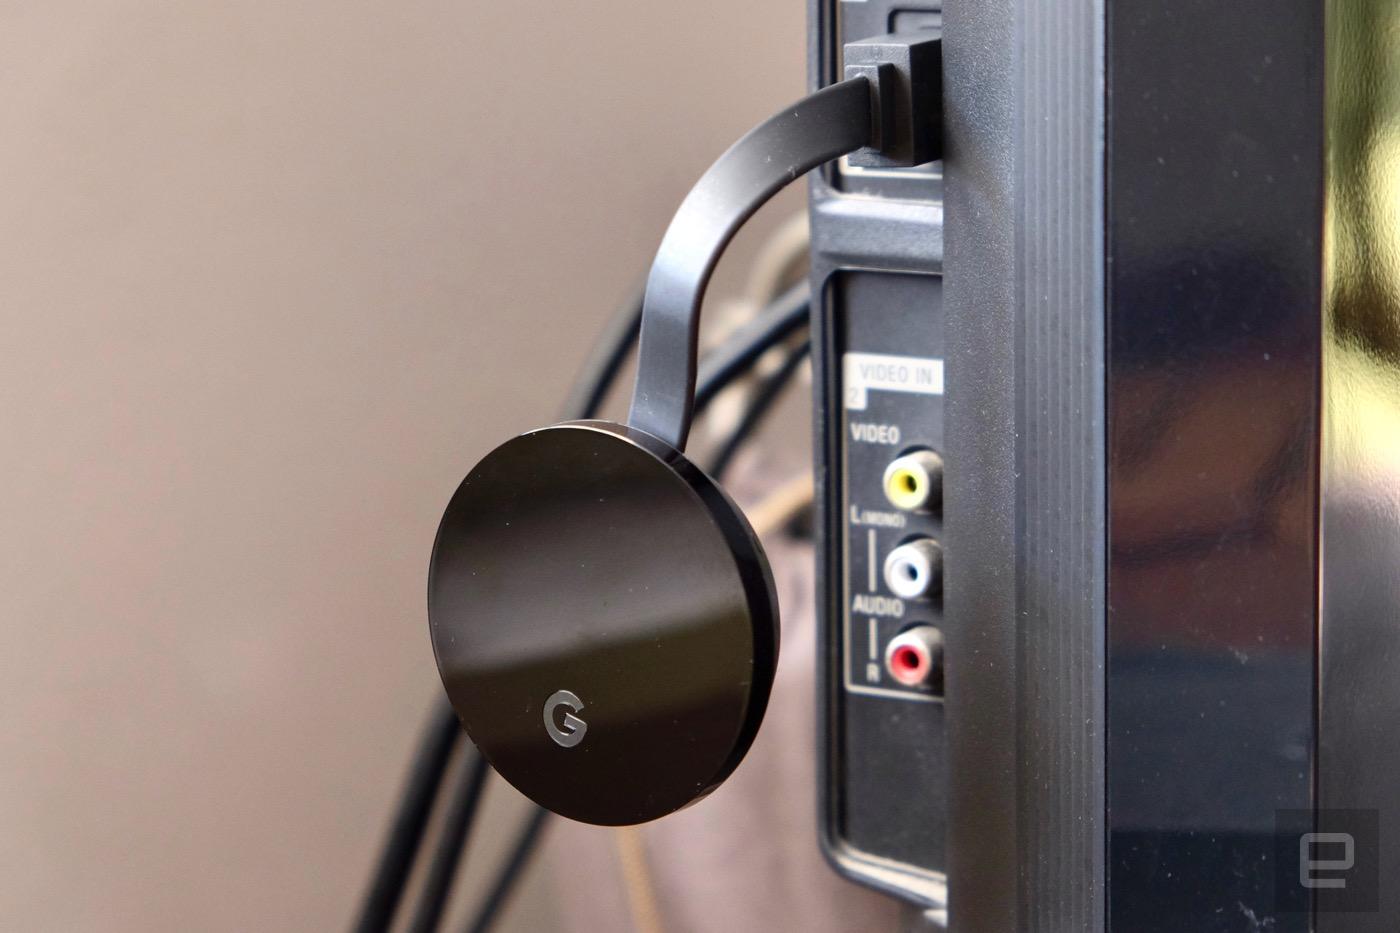 Chromecast Cost